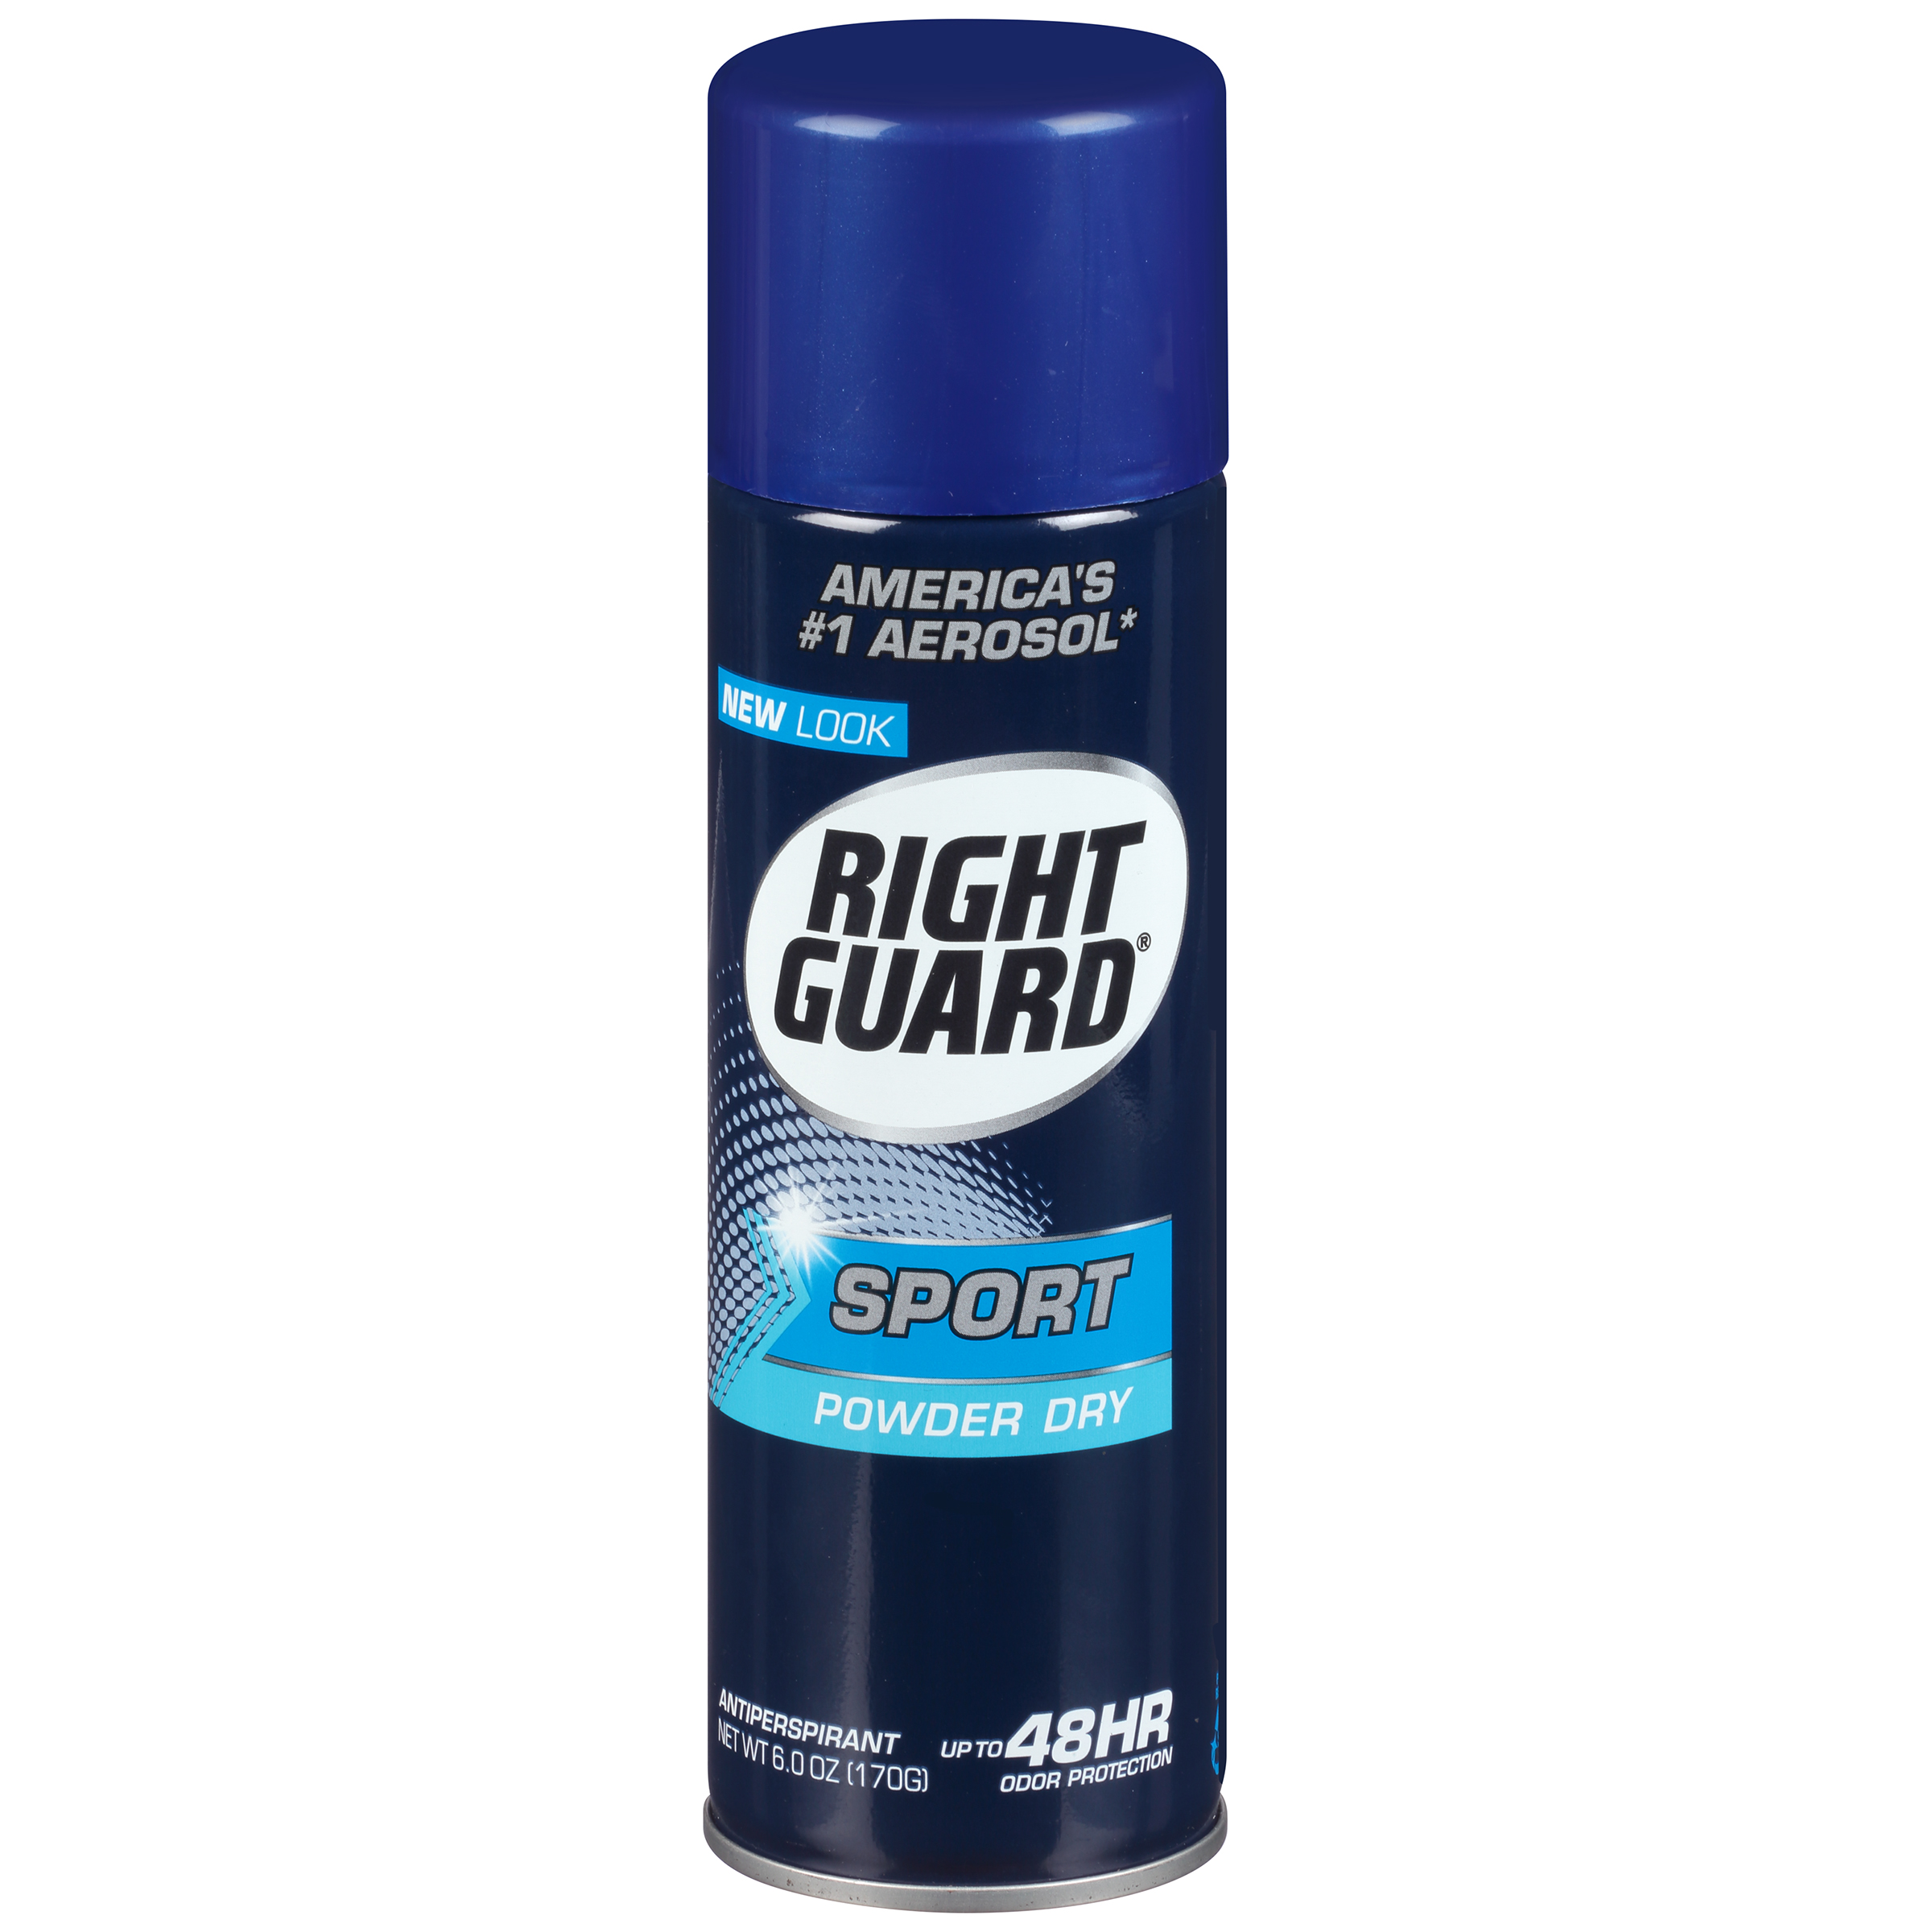 Right Guard Sport Antiperspirant Deodorant Aerosol Spray, Powder Dry, 6 Ounce